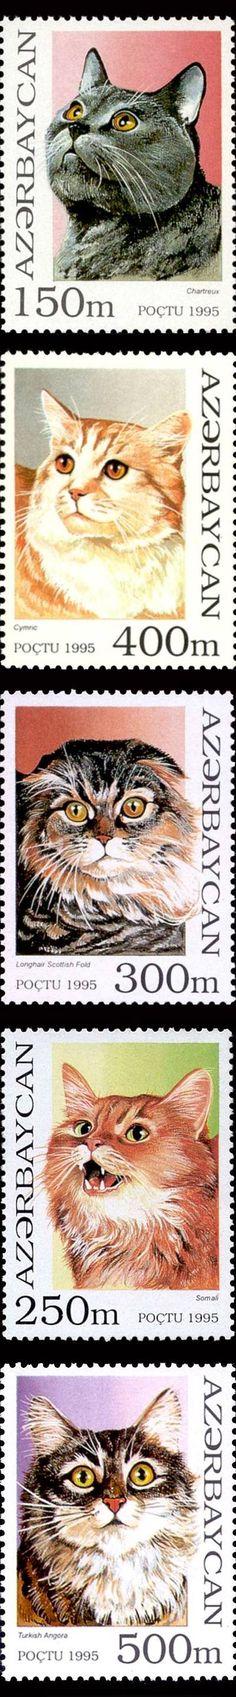 Azerbaijan cat postage stamp series 1995